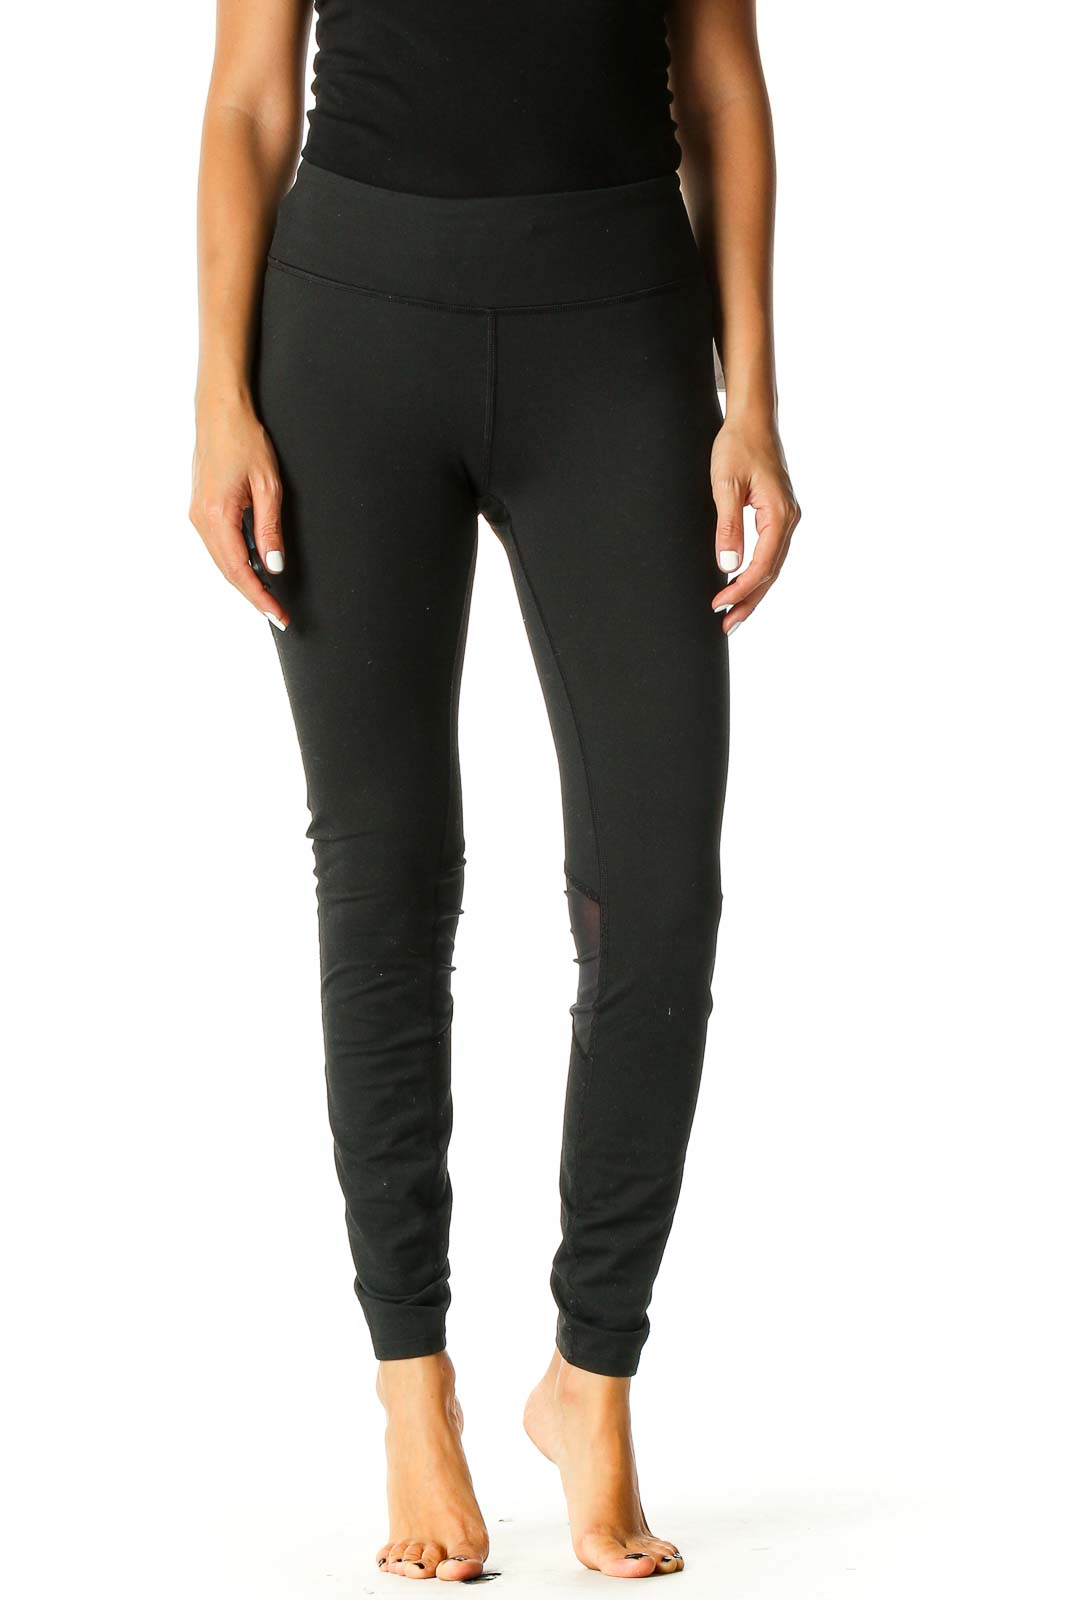 Black Activewear Leggings Front